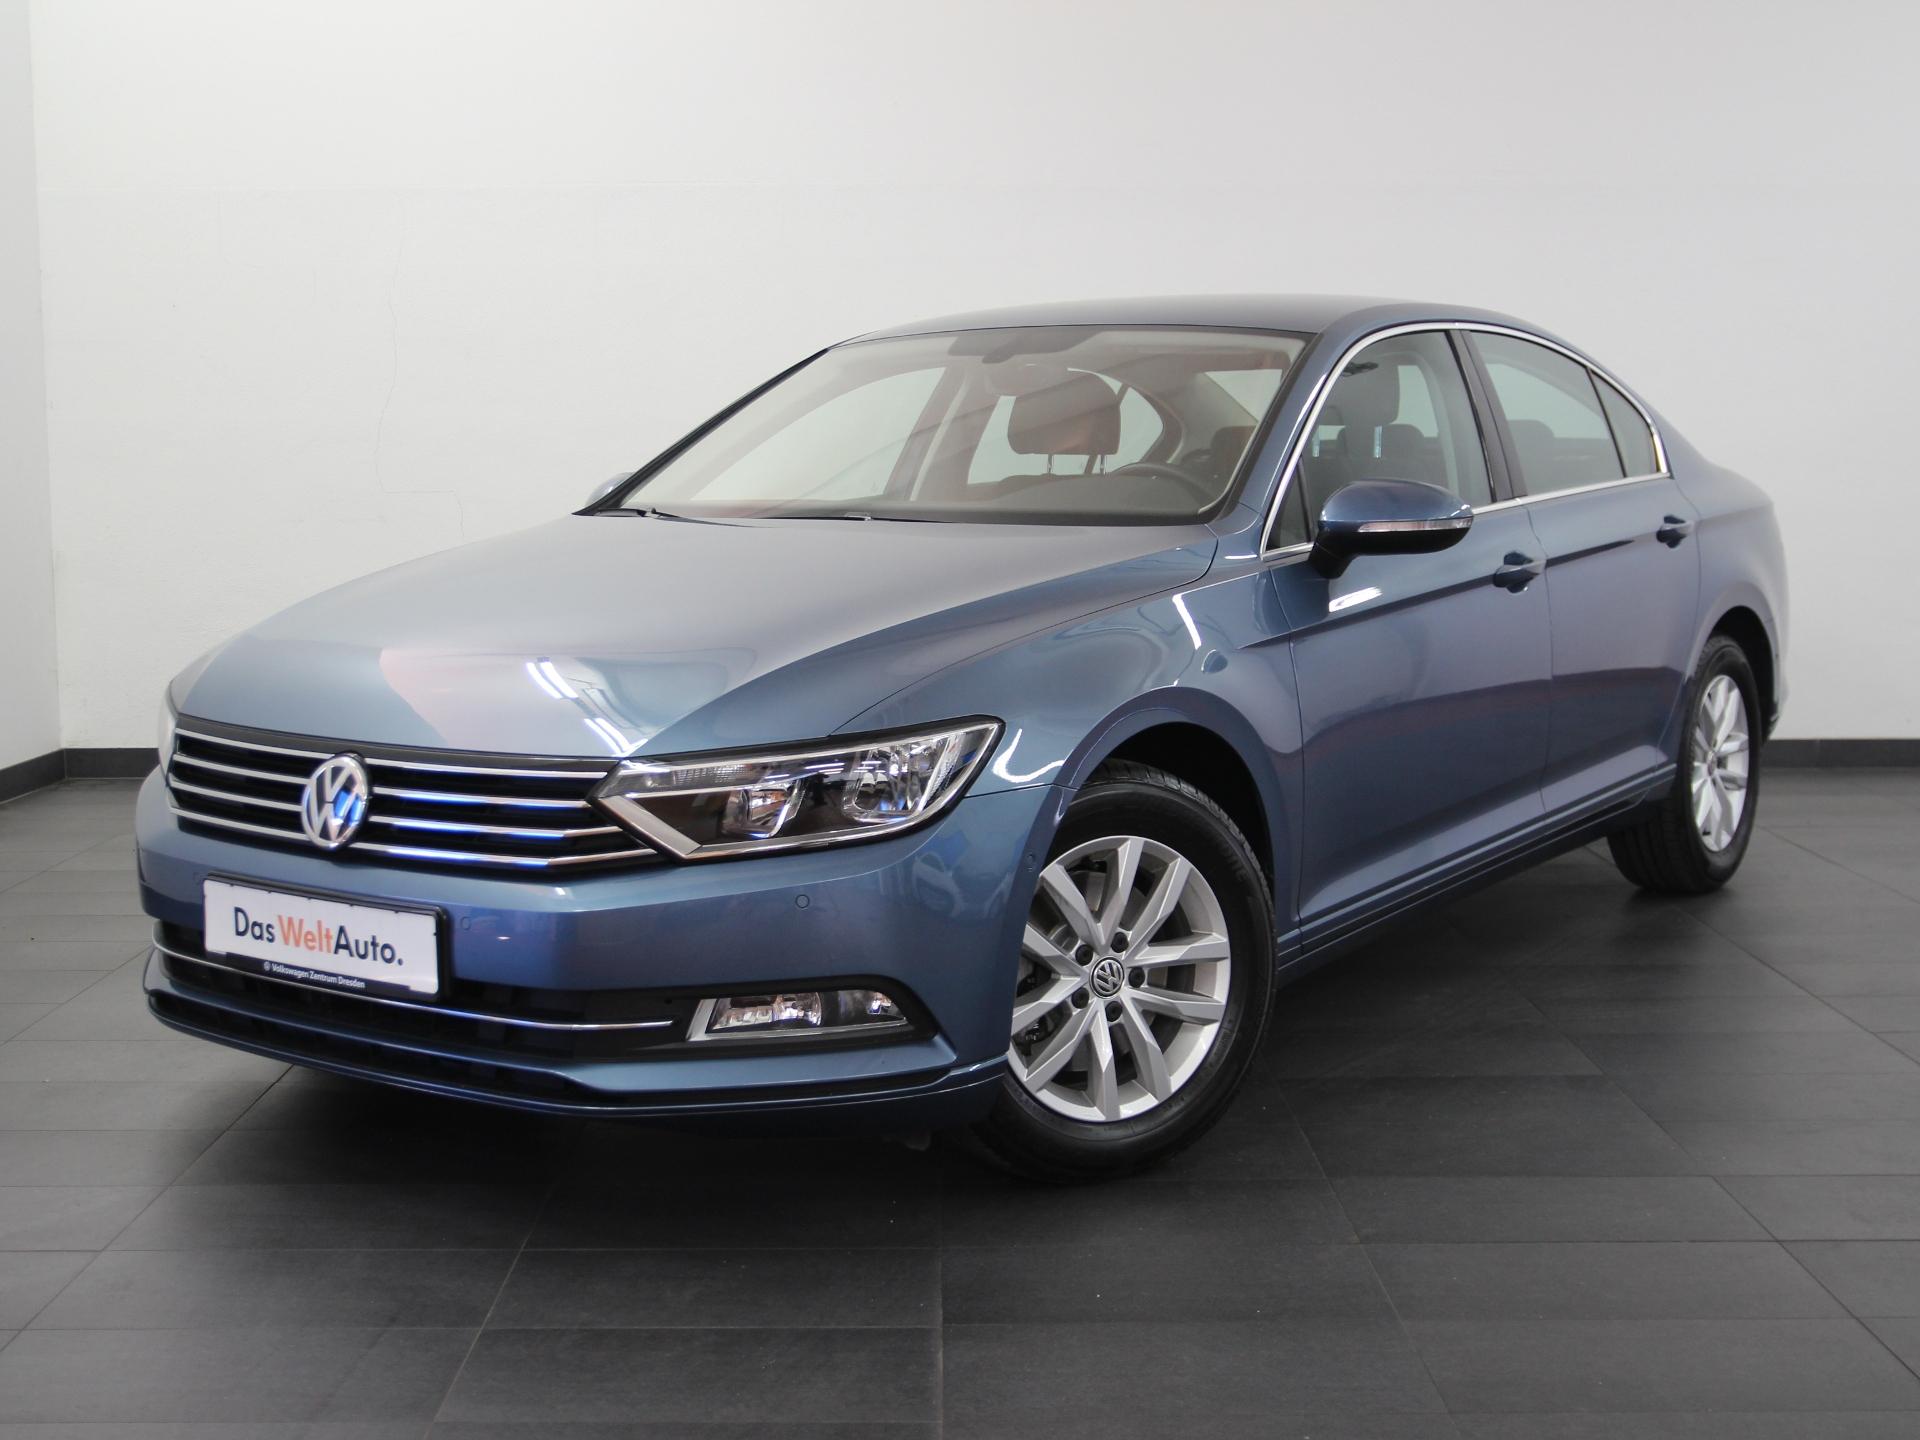 Volkswagen Passat Comfortline TSI NAVI SHZ PDC ab 2,99 %, Jahr 2016, Benzin